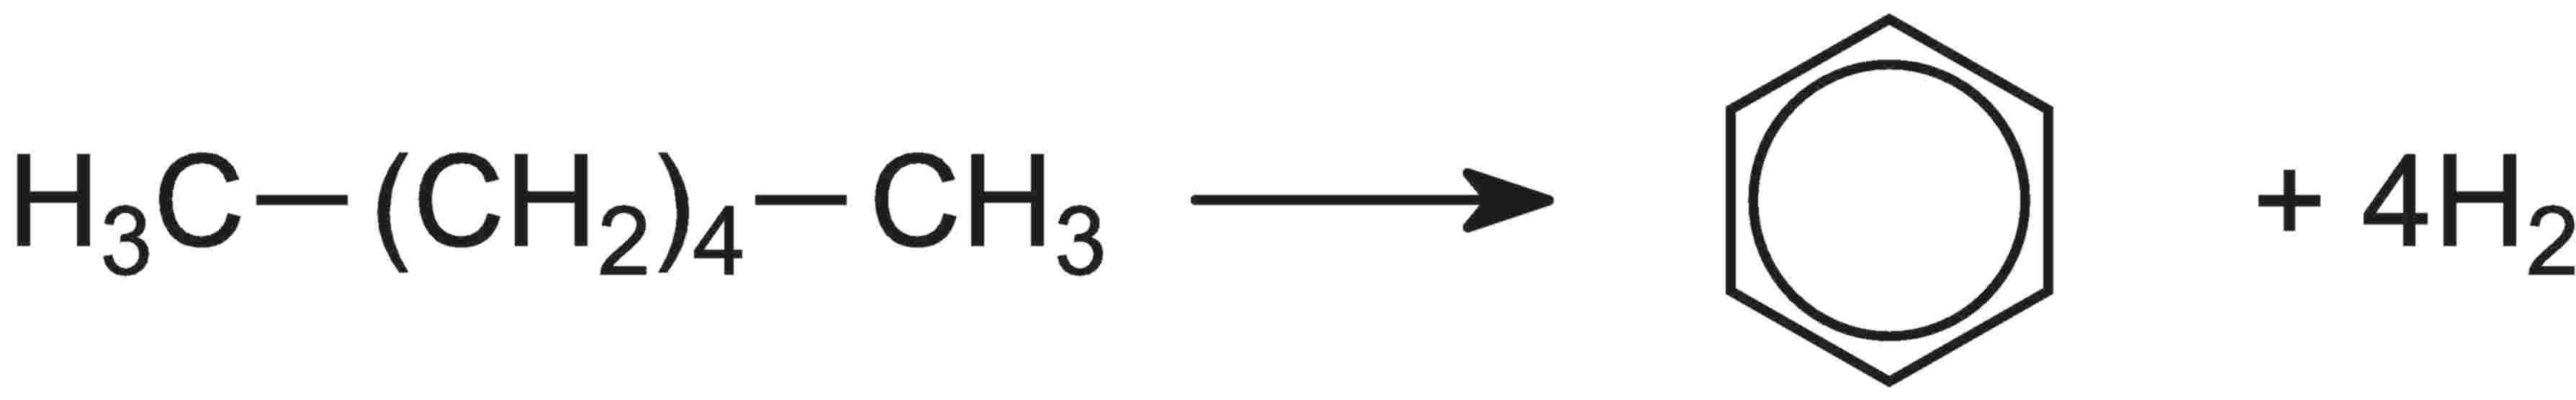 how to make benzene subnautica